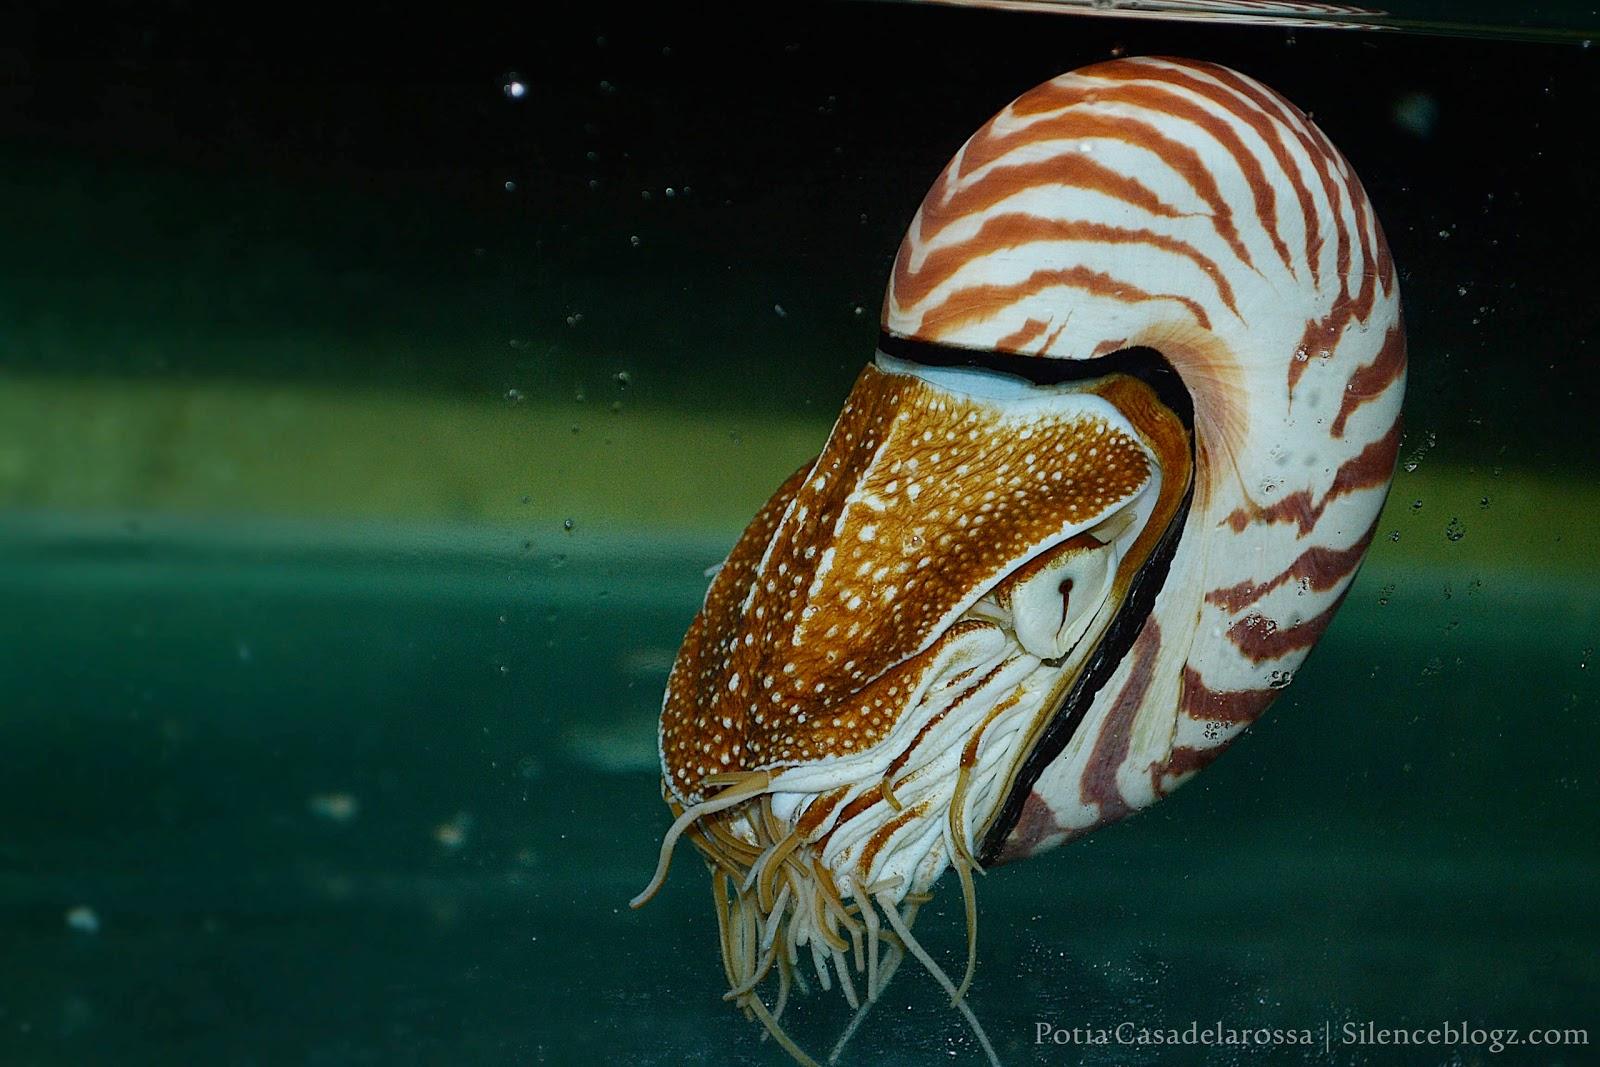 Fosil Hidup, Pearly Nautilus Hidup Jutaan Tahun